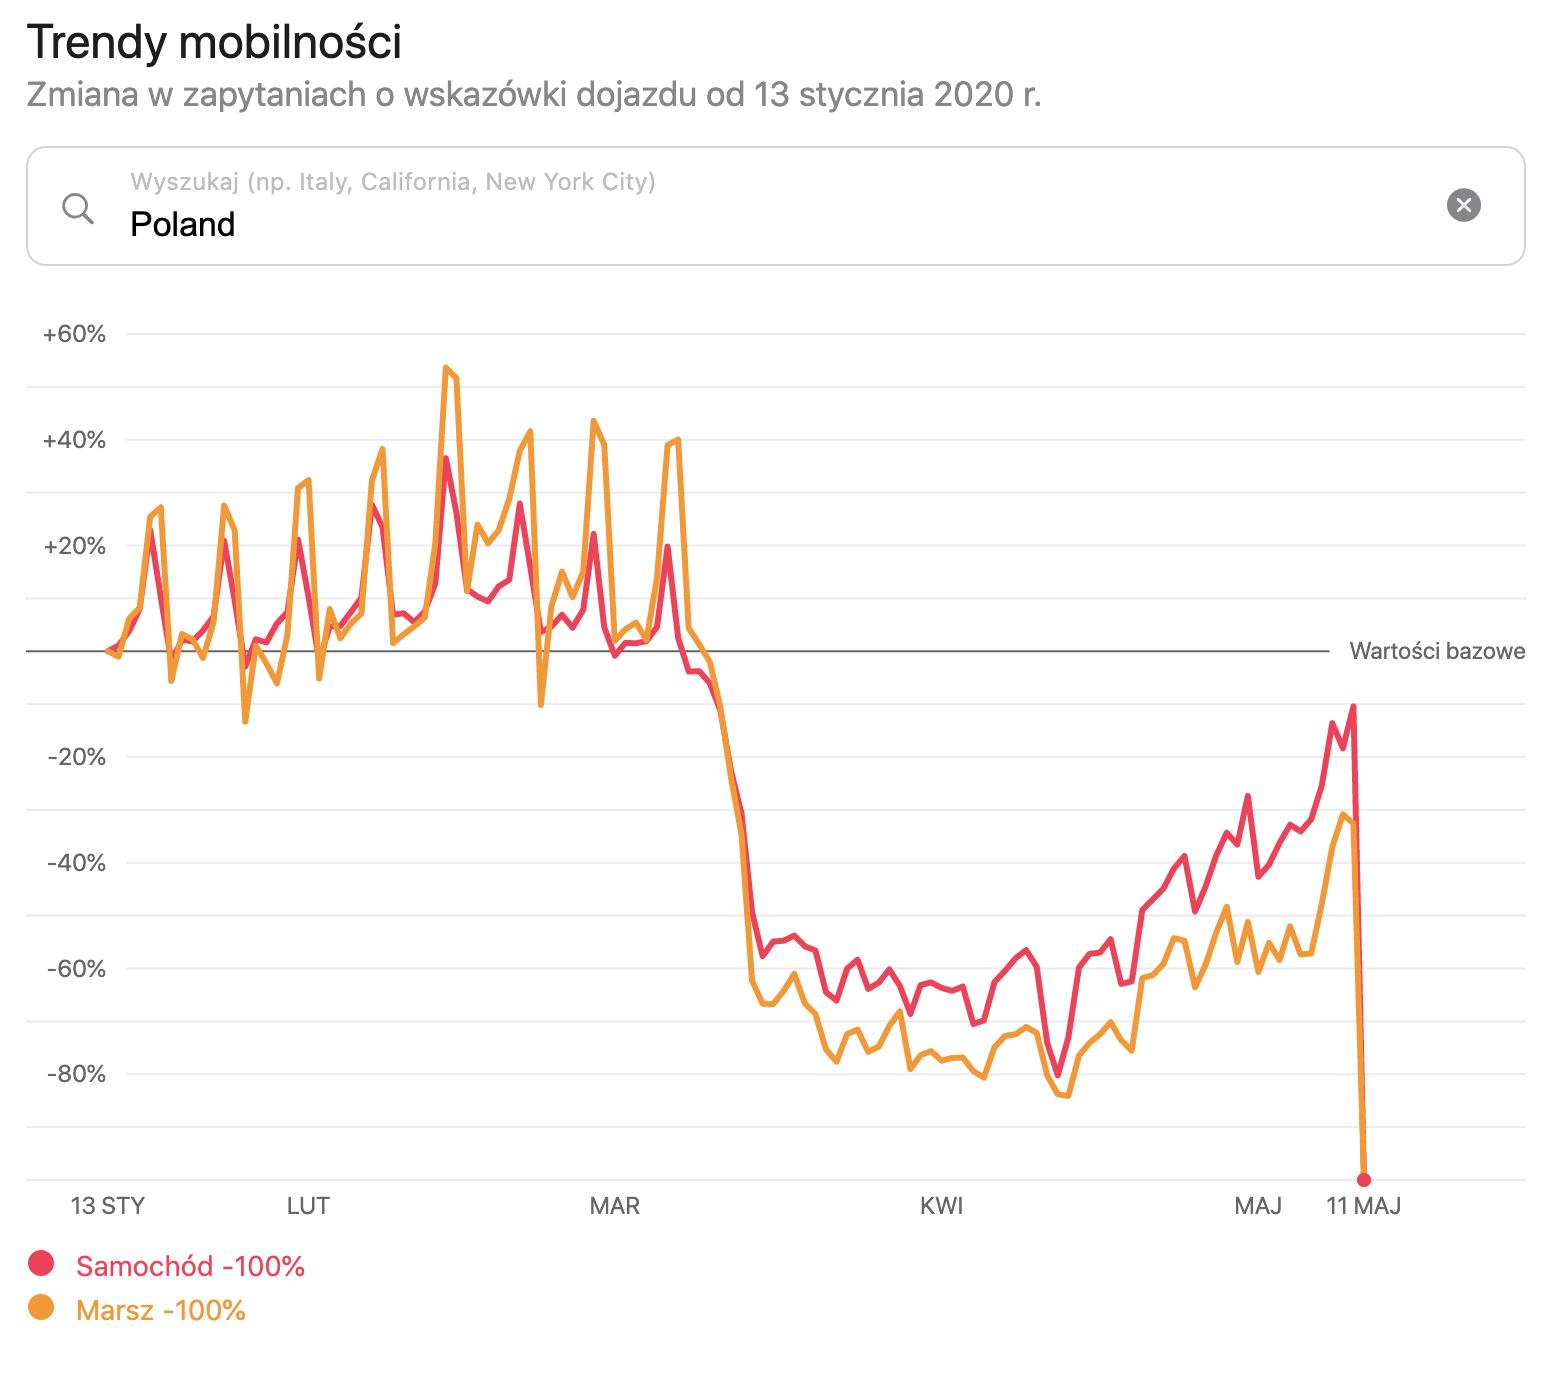 Trendy mobilności Apple: Polska